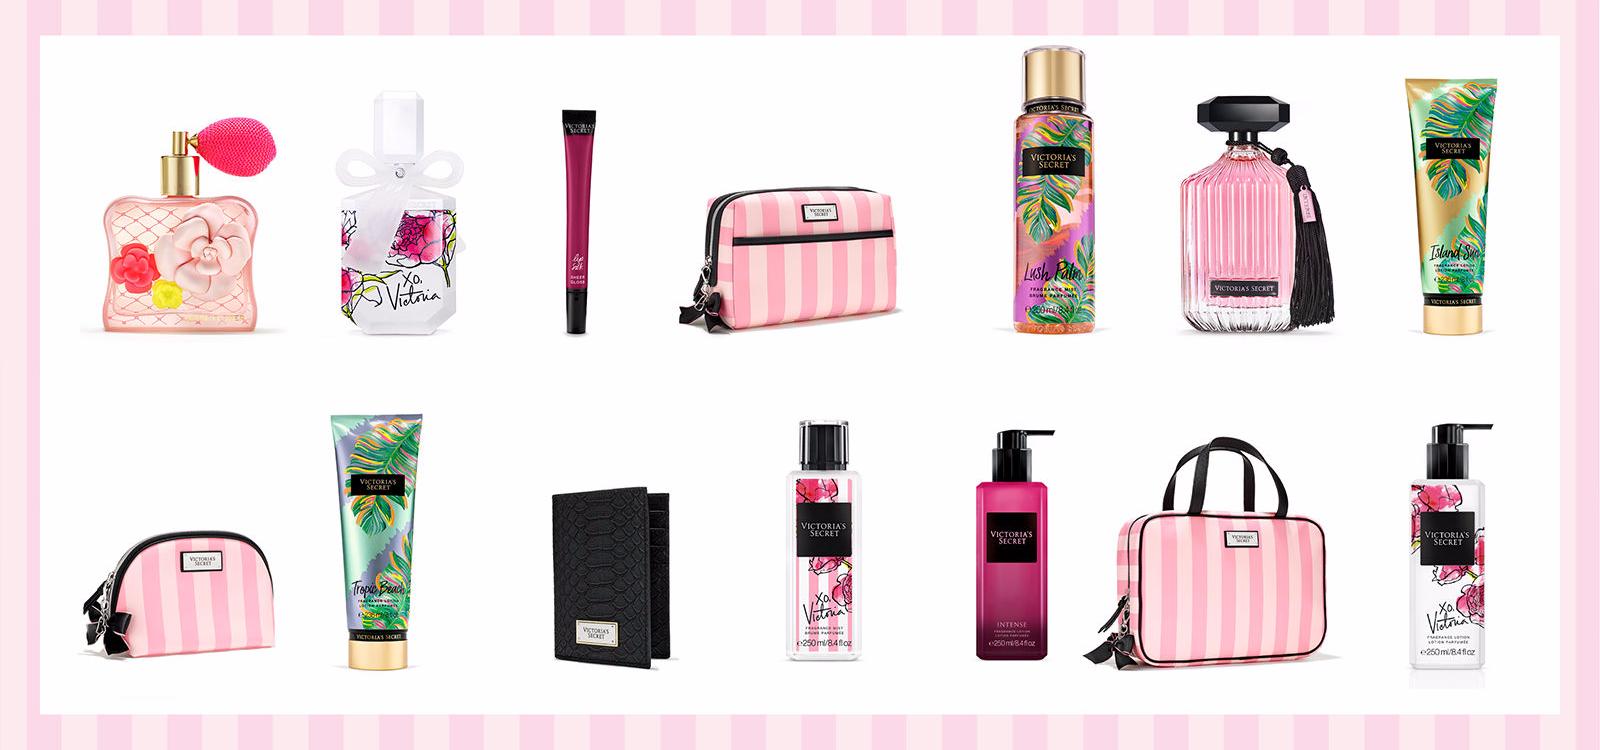 1b463e499de5a Victoria s Secret Is Offering Big Discounts During Its Semi-Annual Sale